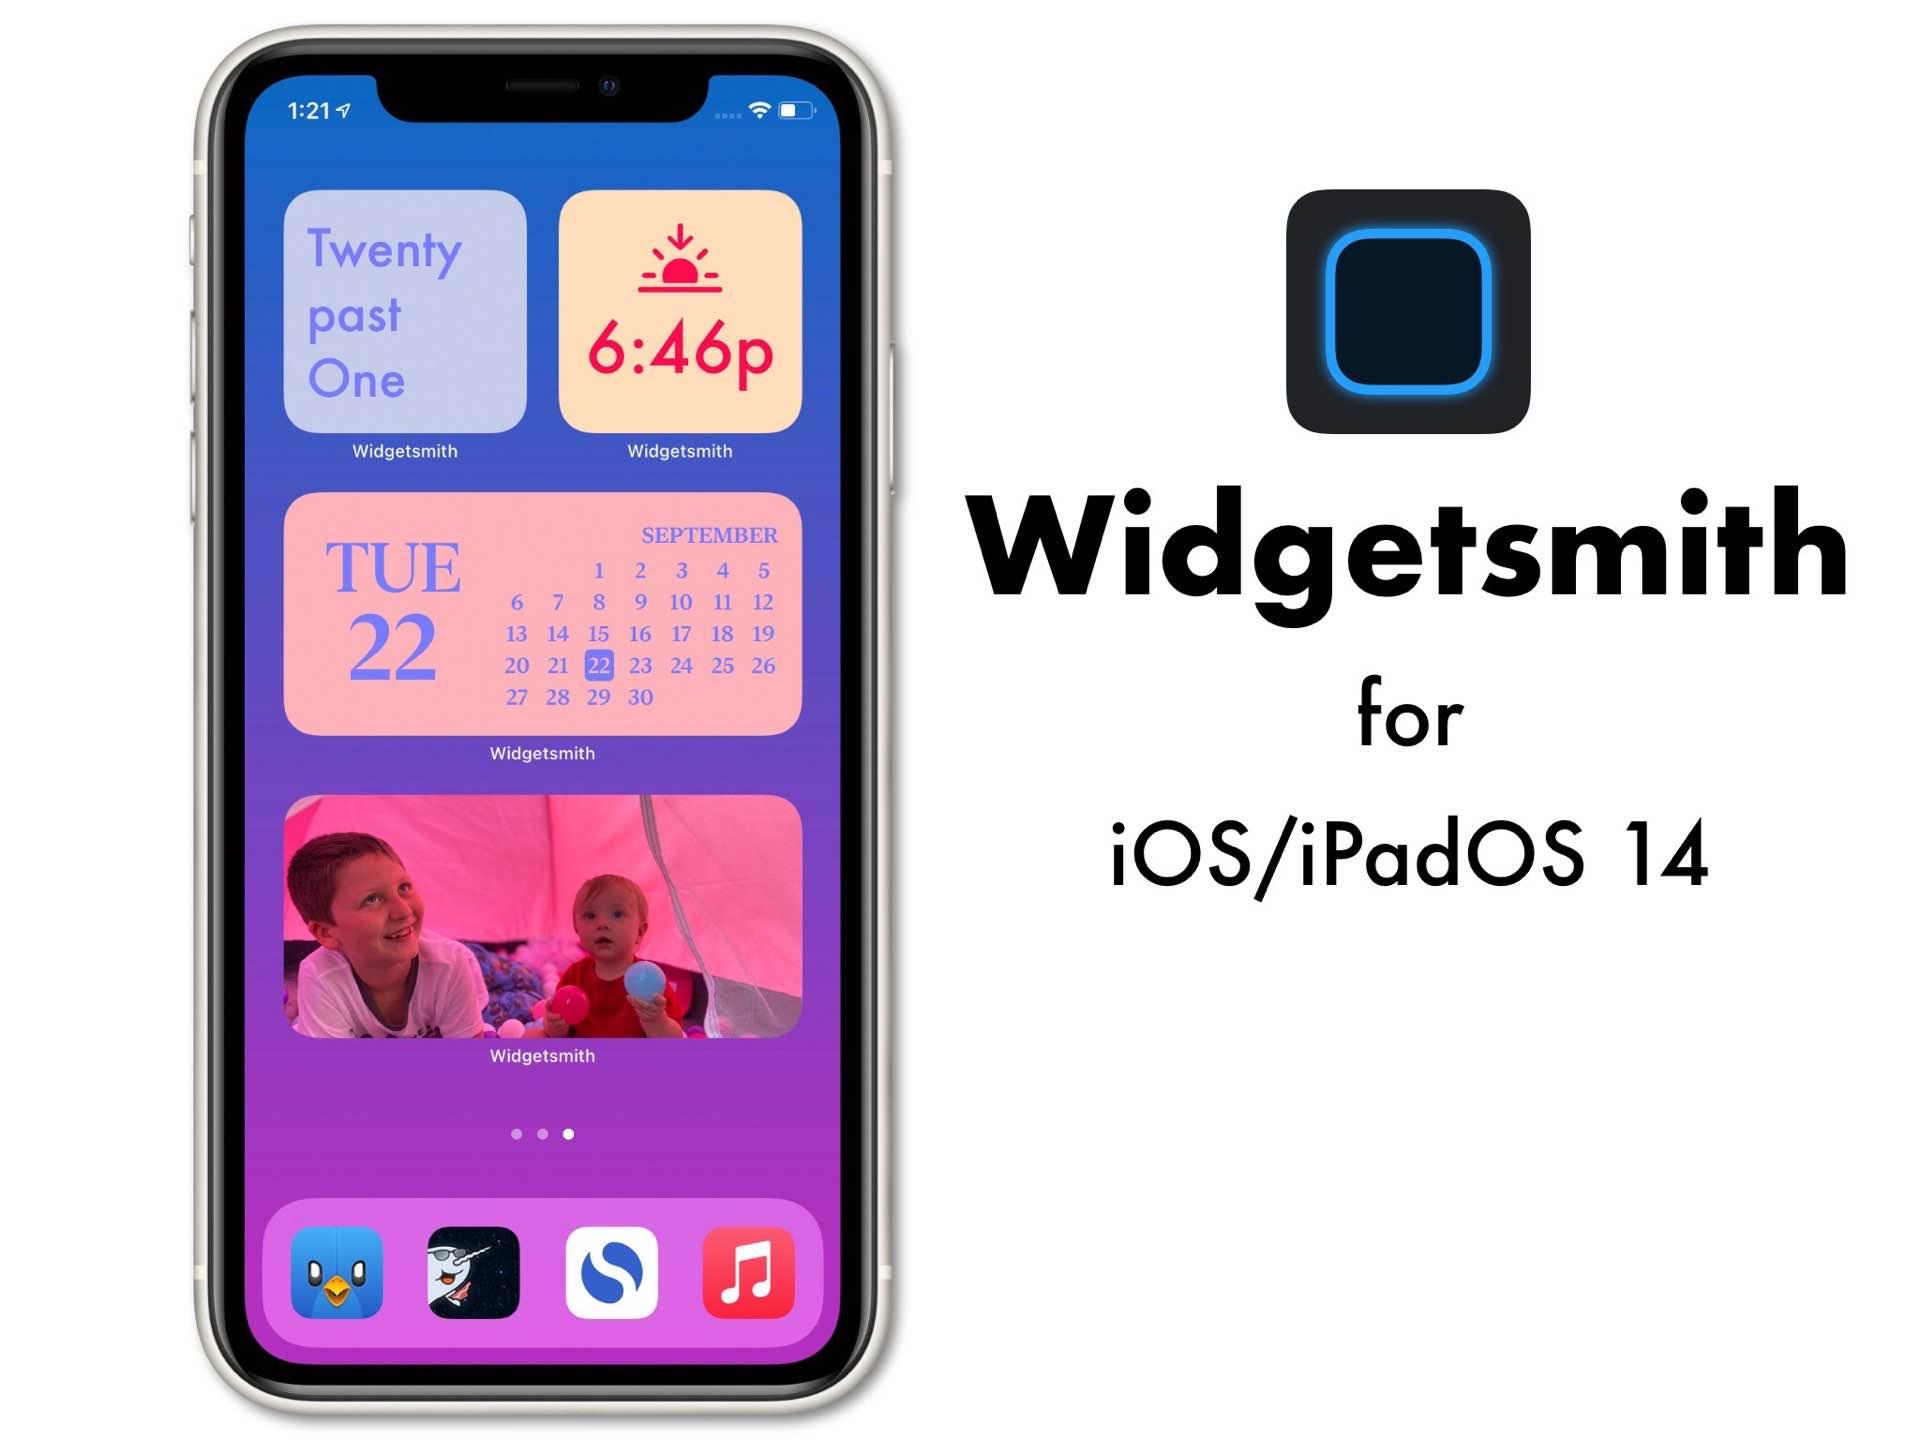 widgetsmith-for-iphone-and-ipad